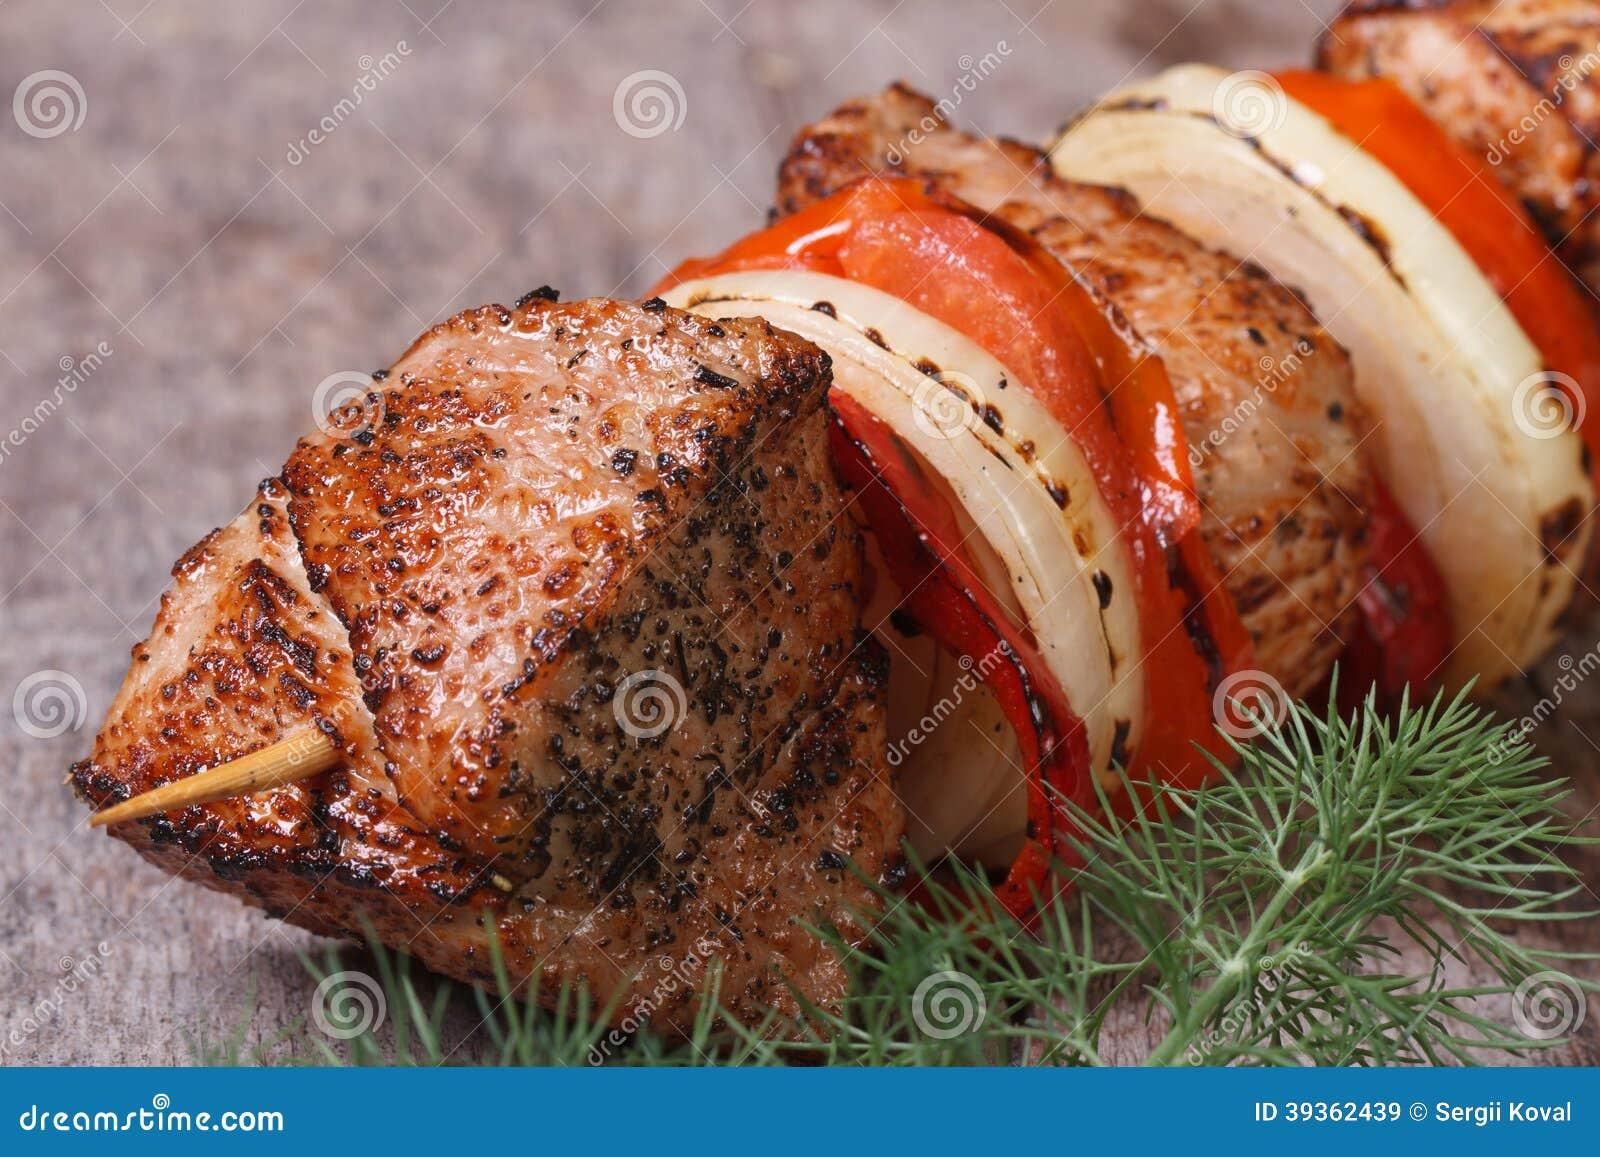 Tasty grilled shish kebab with vegetables